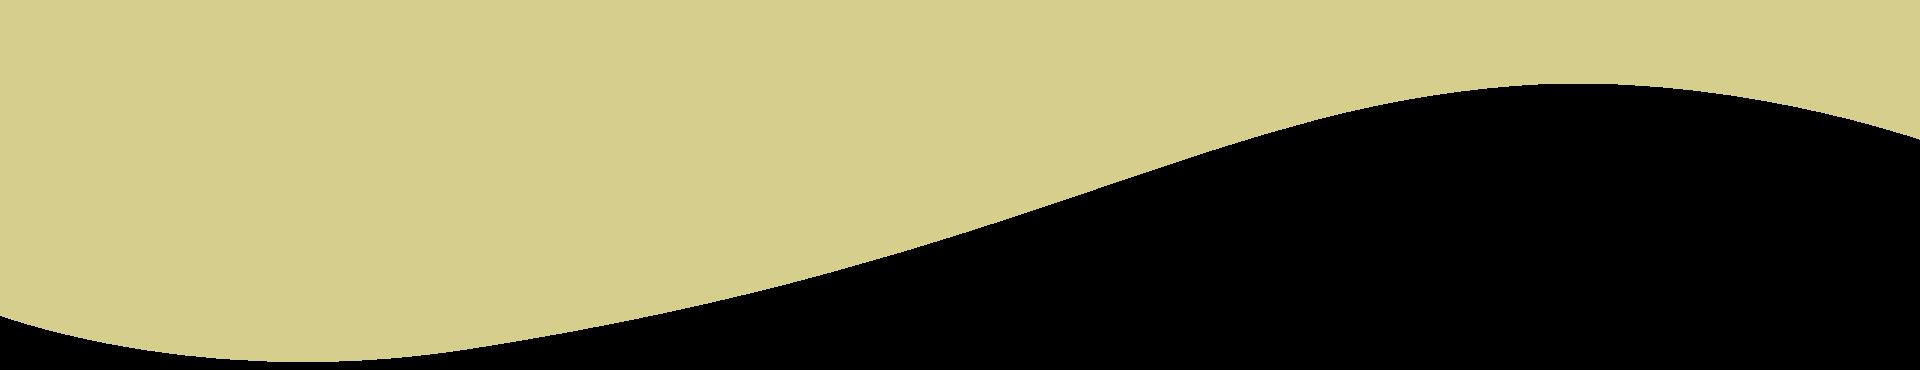 one-month-bgr-yellow2